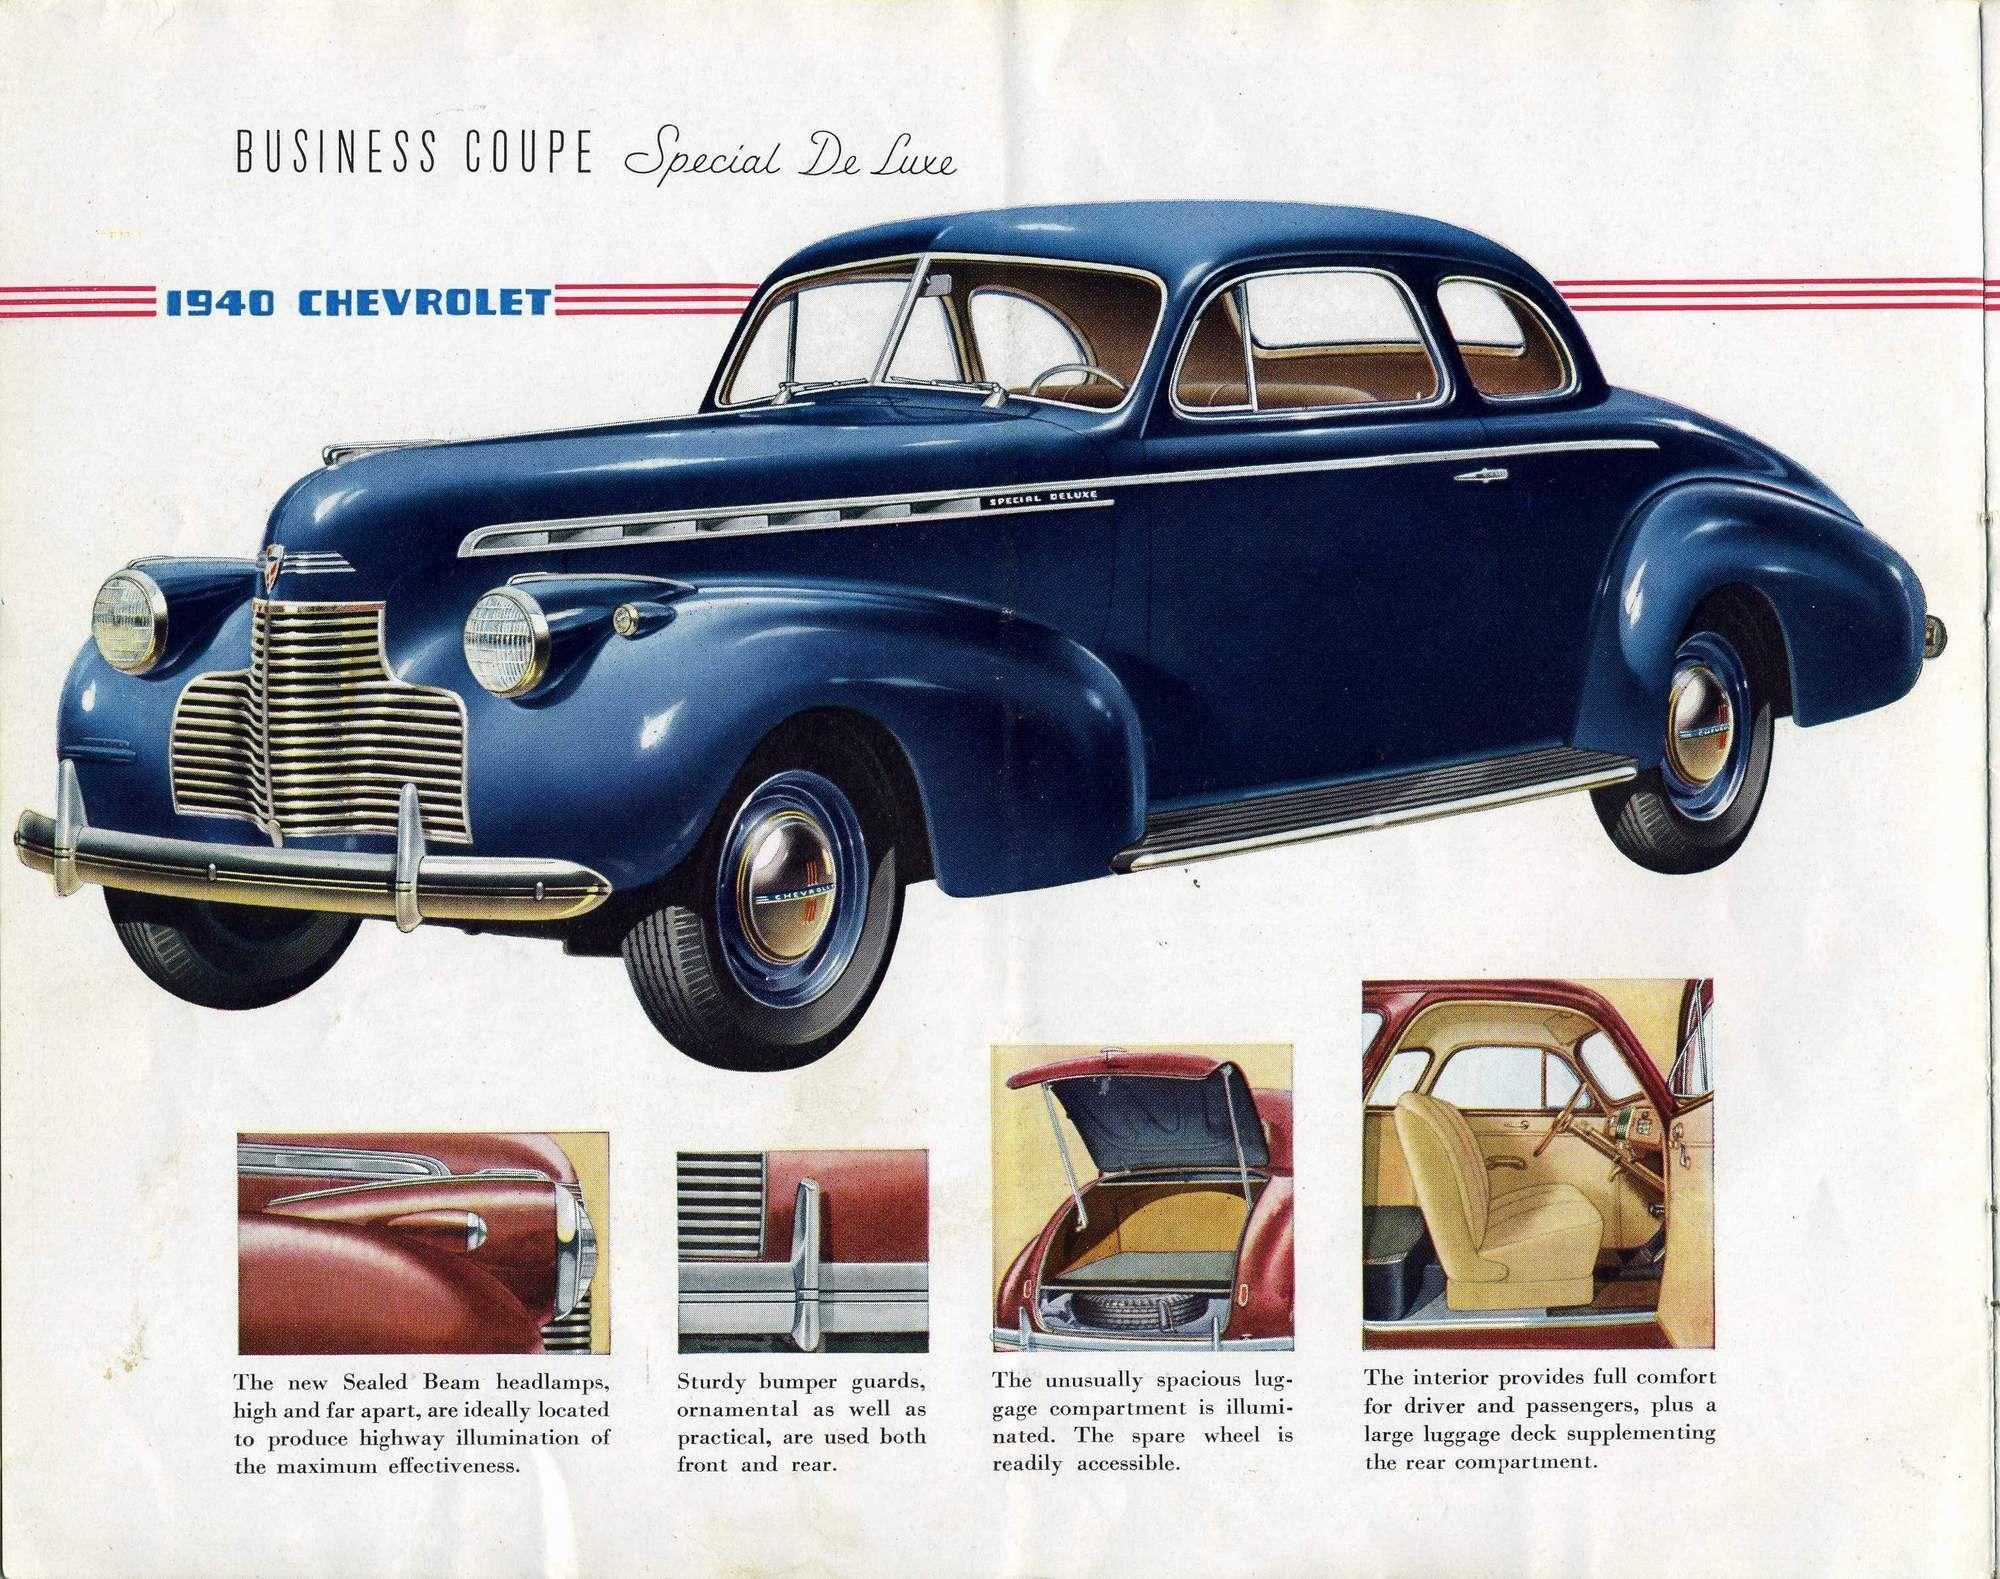 1940 chevrolet coupe | ... Chevrolet/1940_Chevrolet/1940_Chevrolet_Brochure/ 1940%20Chevrolet-03